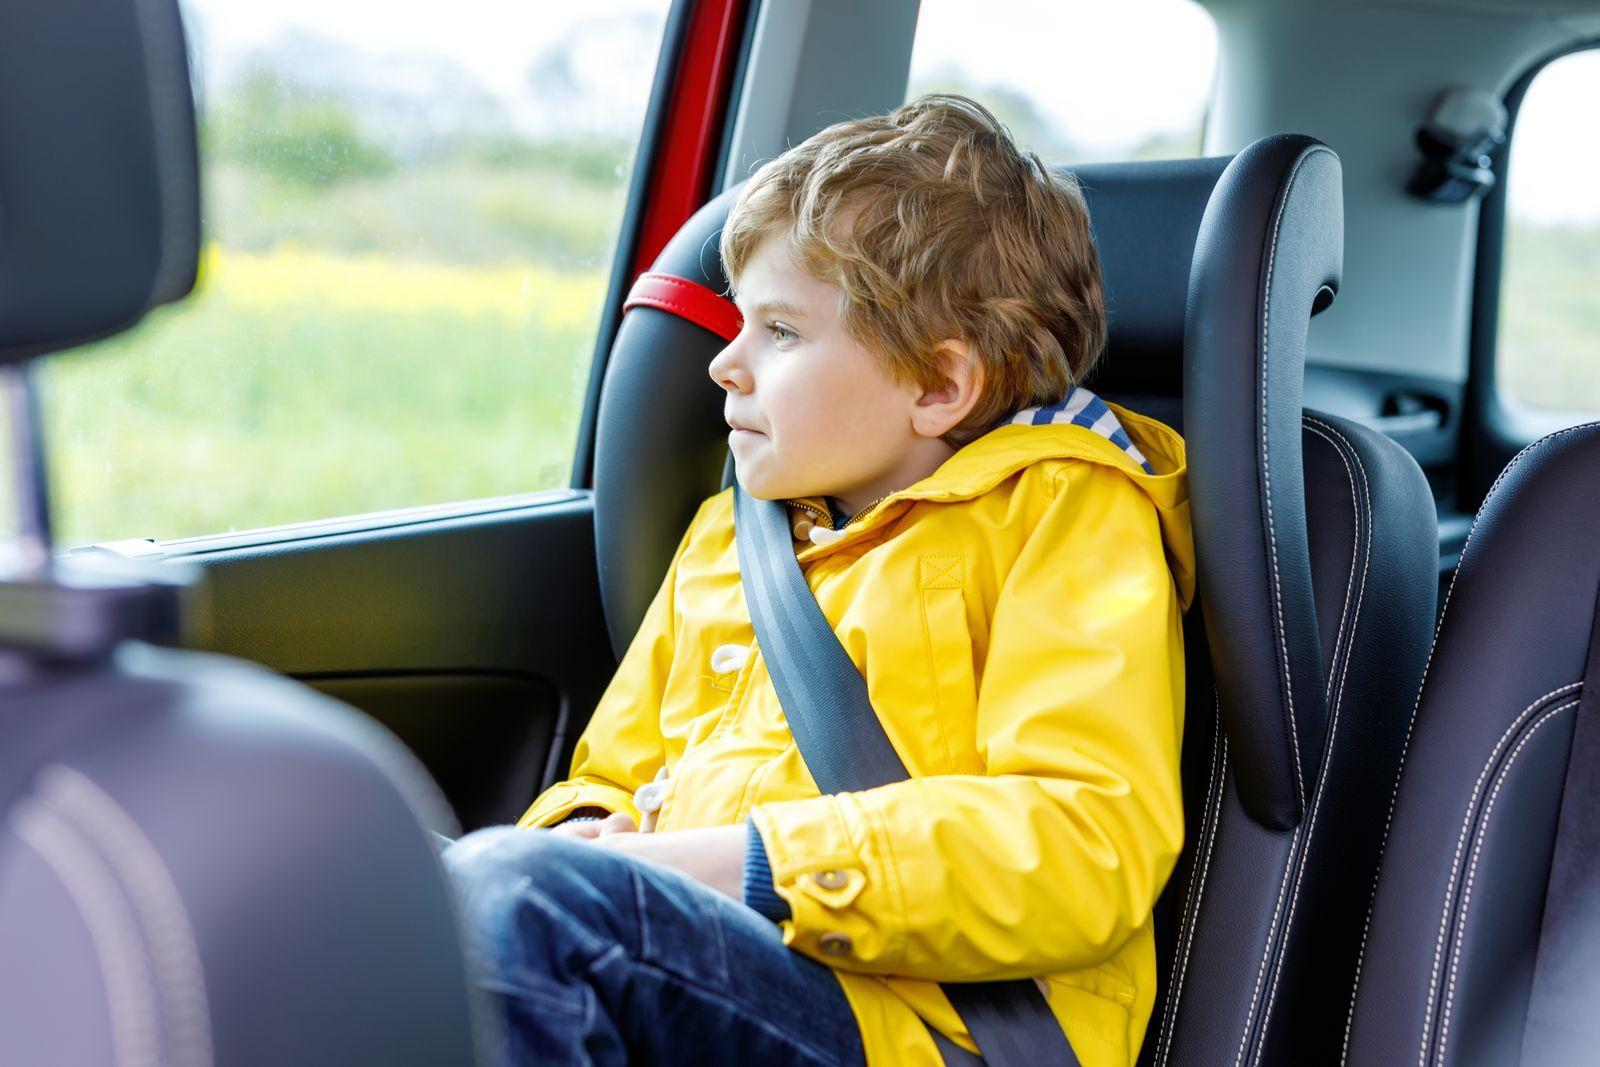 Adorable cute preschool kid boy sitting in car in yellow rain coat.